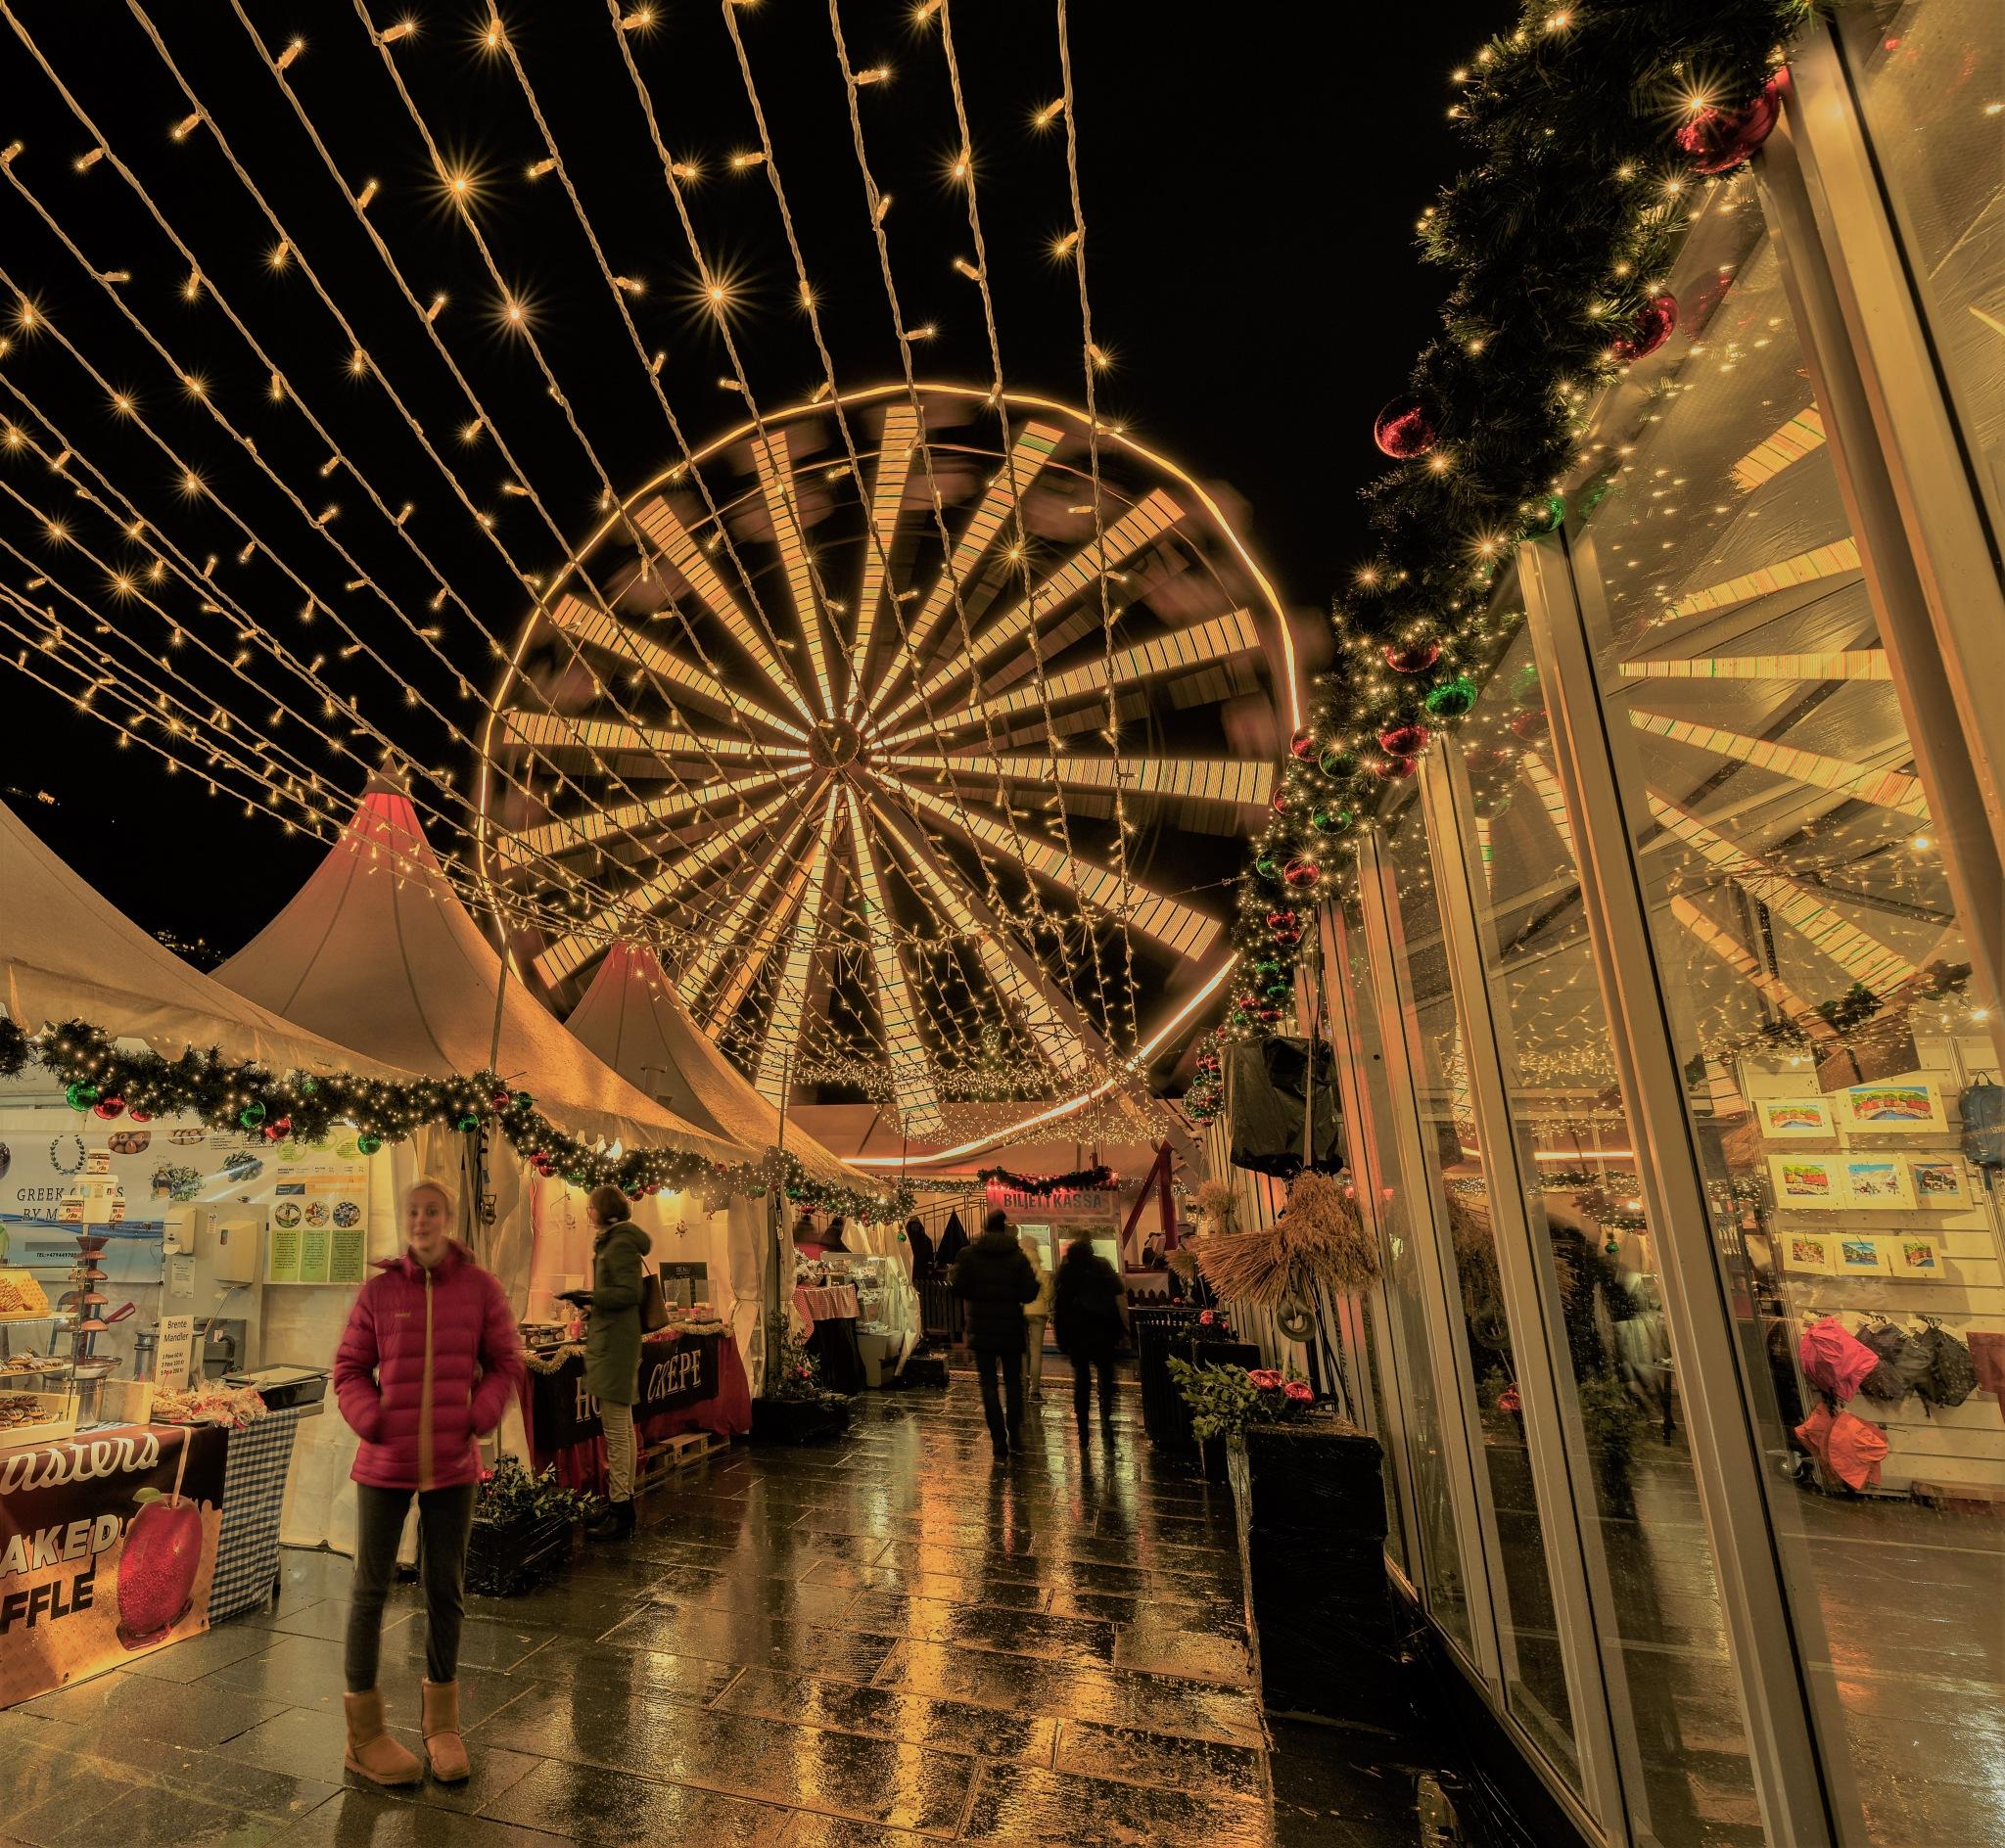 Christmas marked at night by Svein-Rene Kraakenes